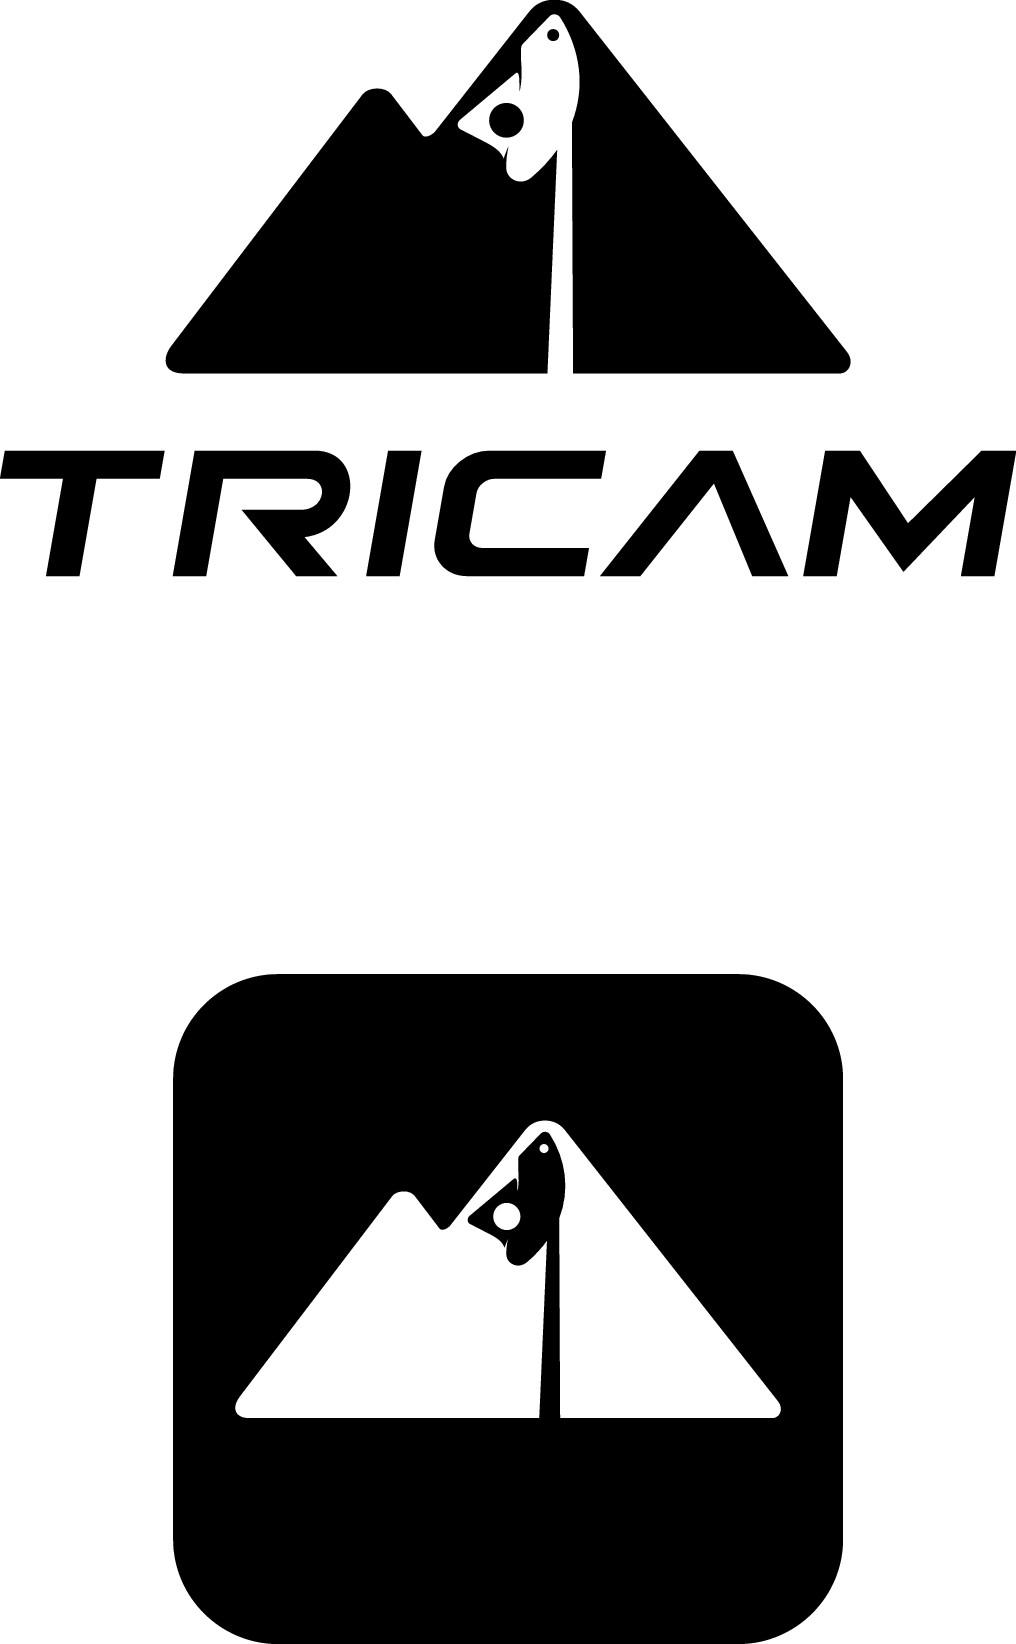 Design rock climbing gear into a business logo!